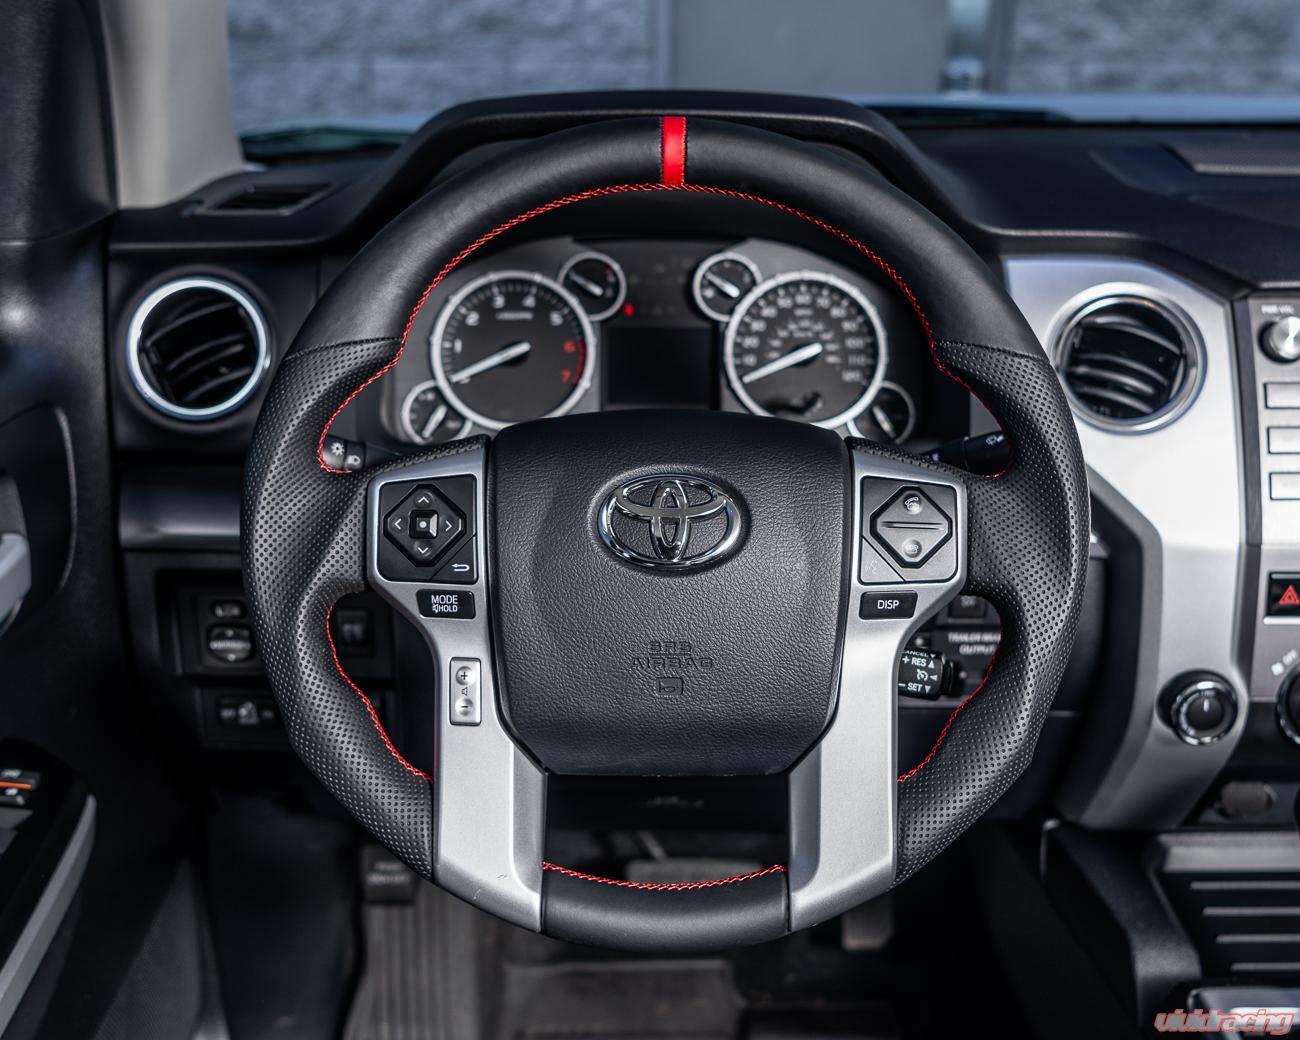 hight resolution of toyota tundra 4runner tacoma oem steering wheel carbon fiber white stitching vr